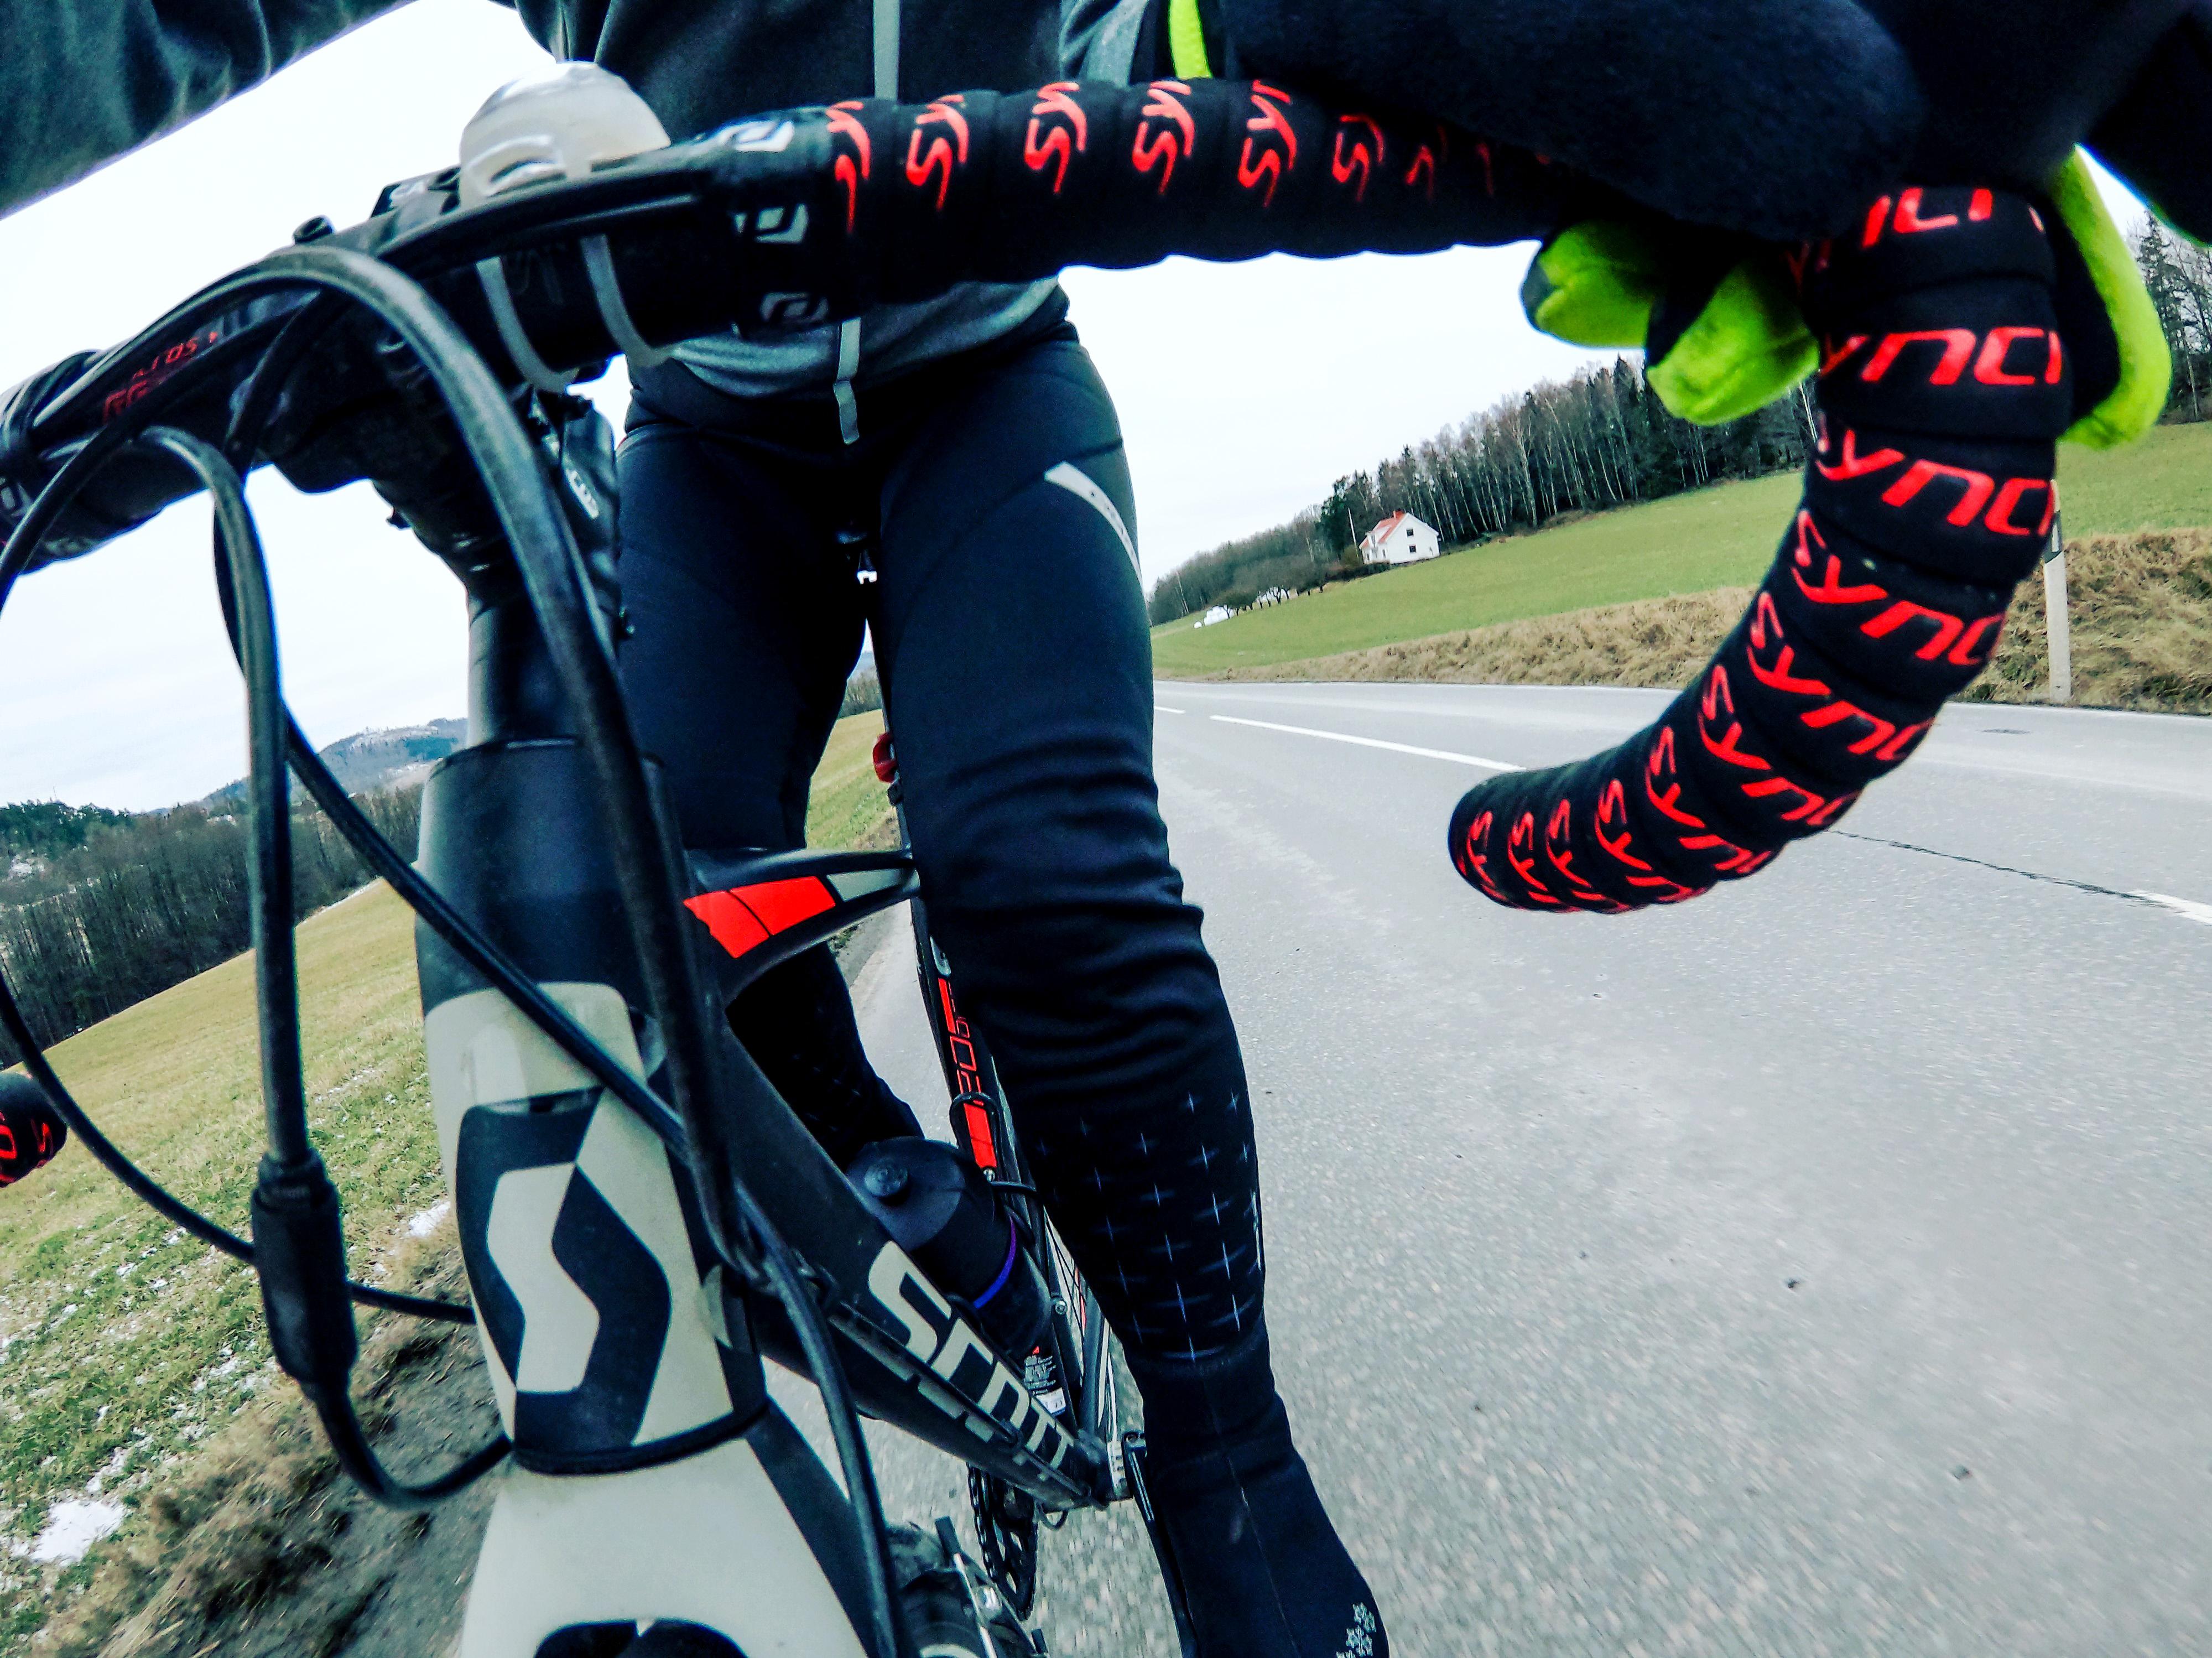 När cykelskorna sitter fast i pedalen Elna Dahlstrand